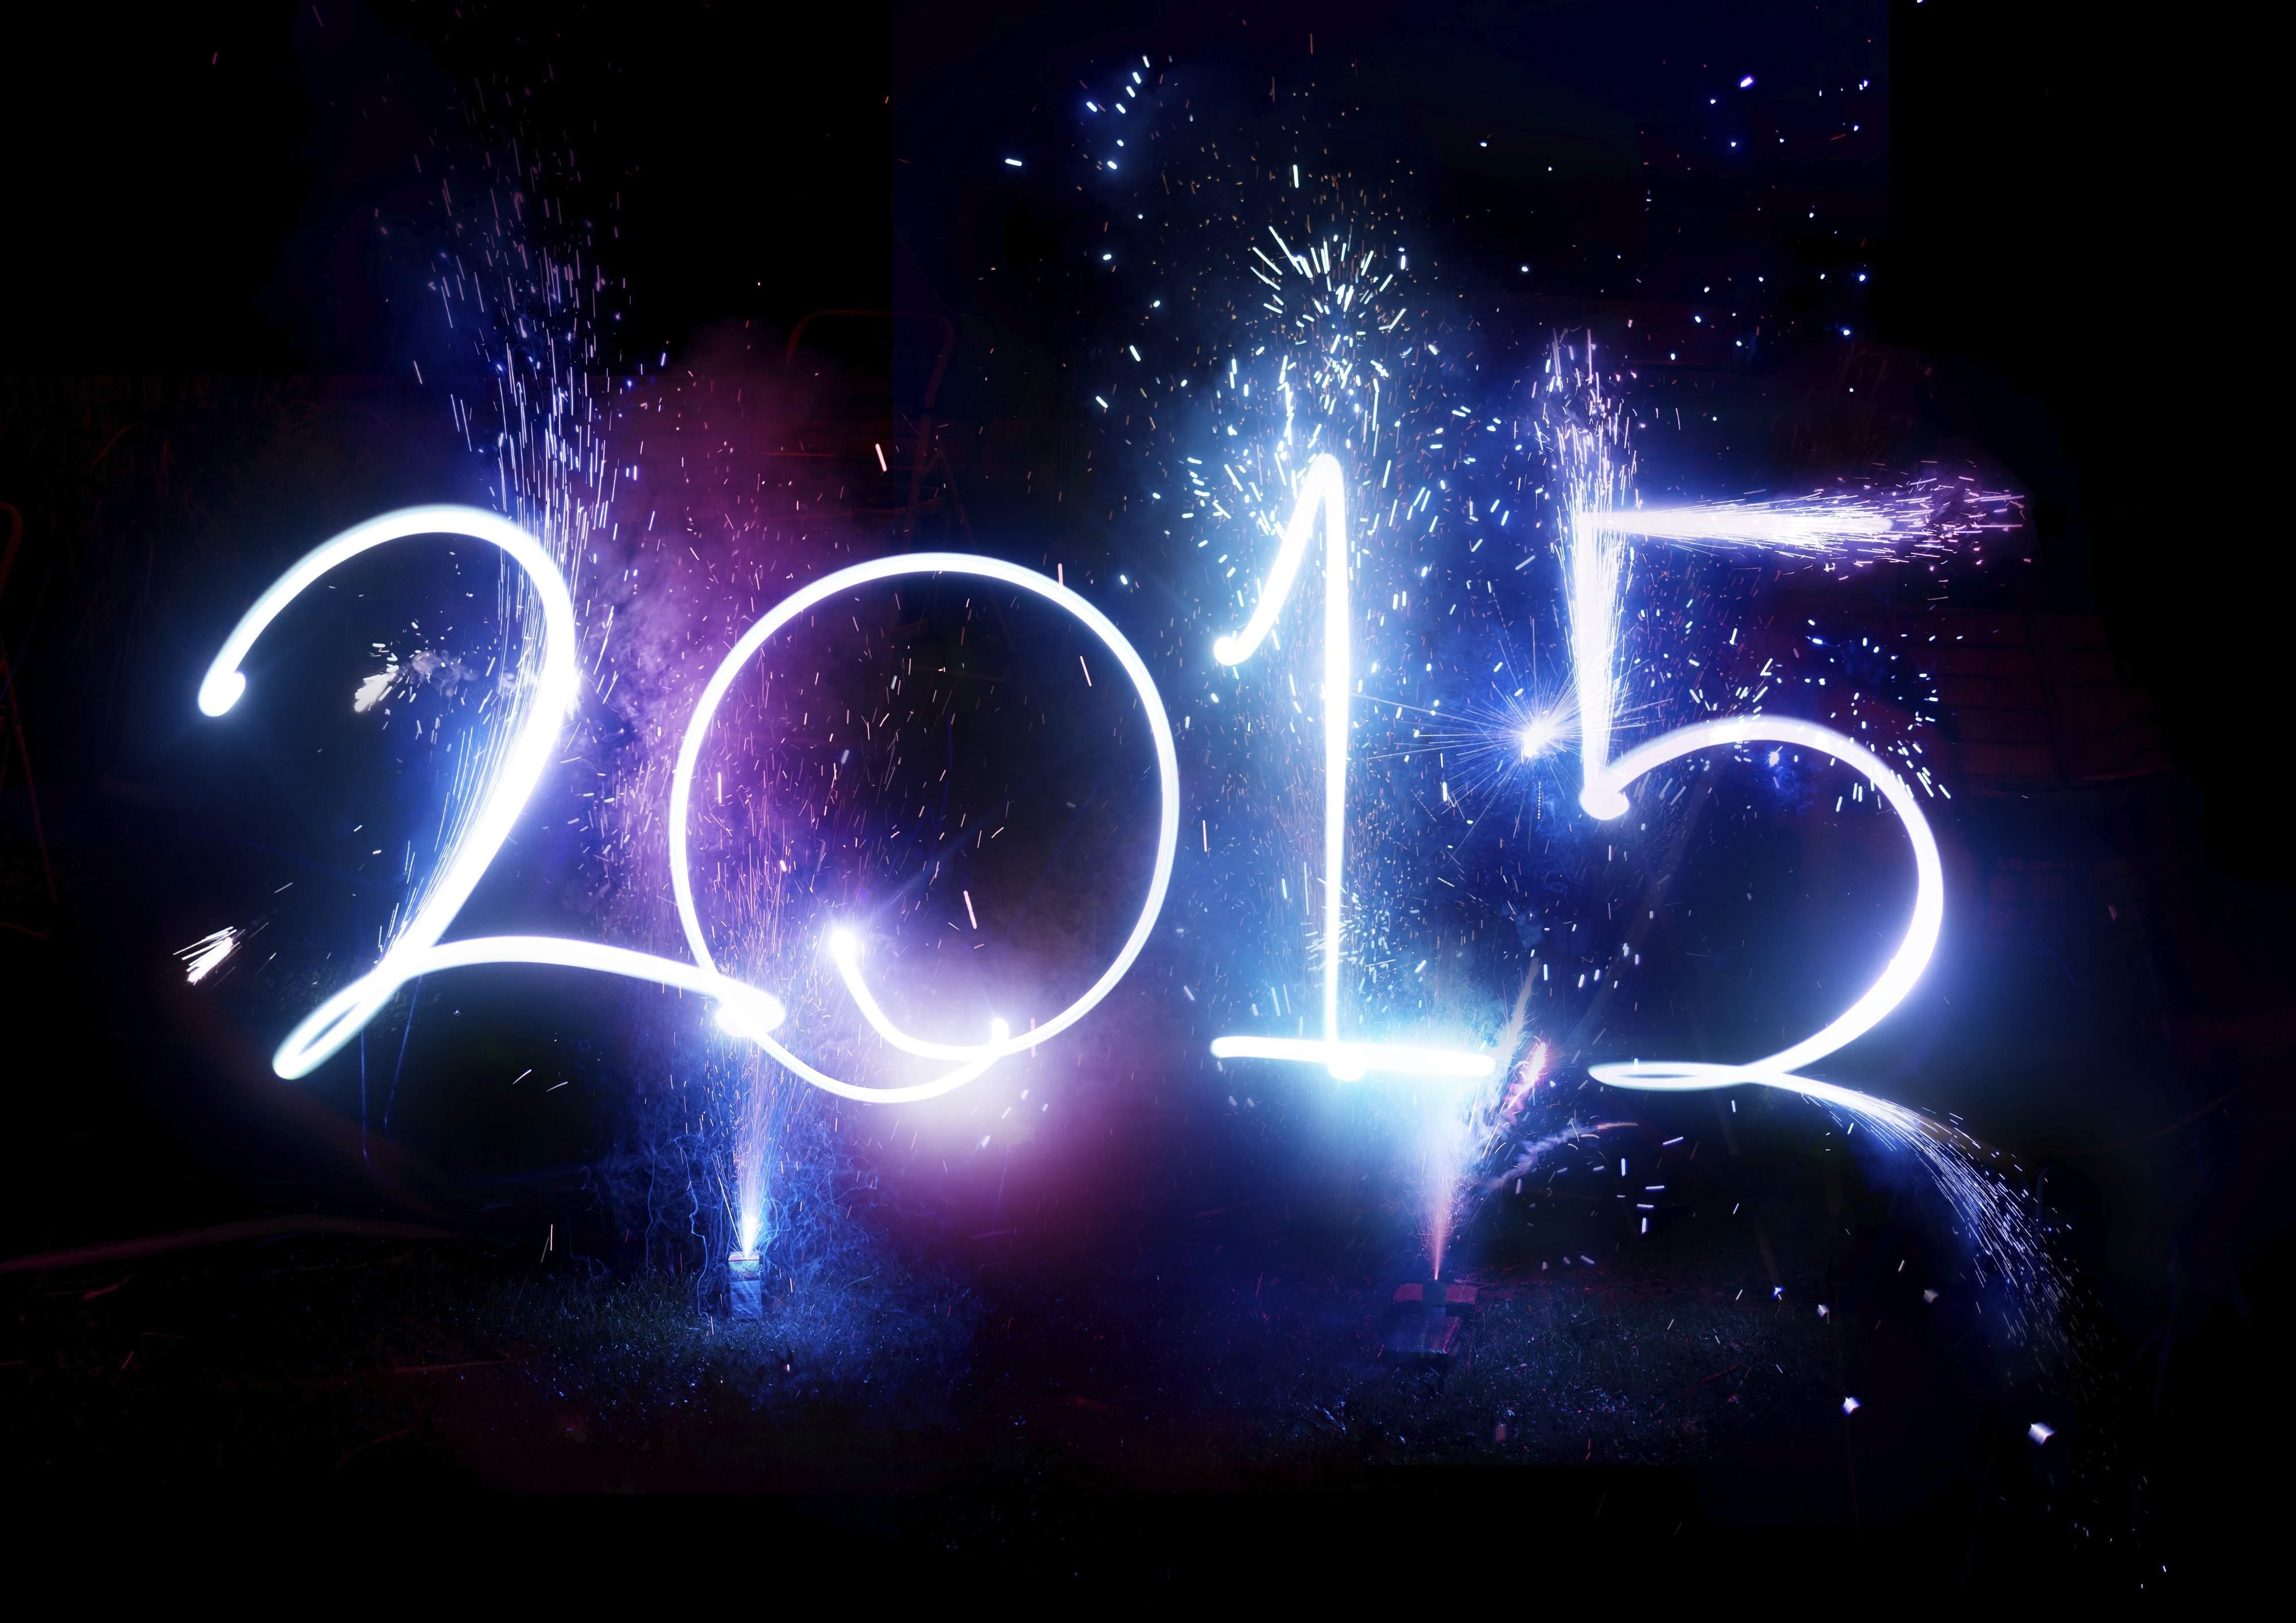 #0522 [Session-Life] Rückblick auf 2015